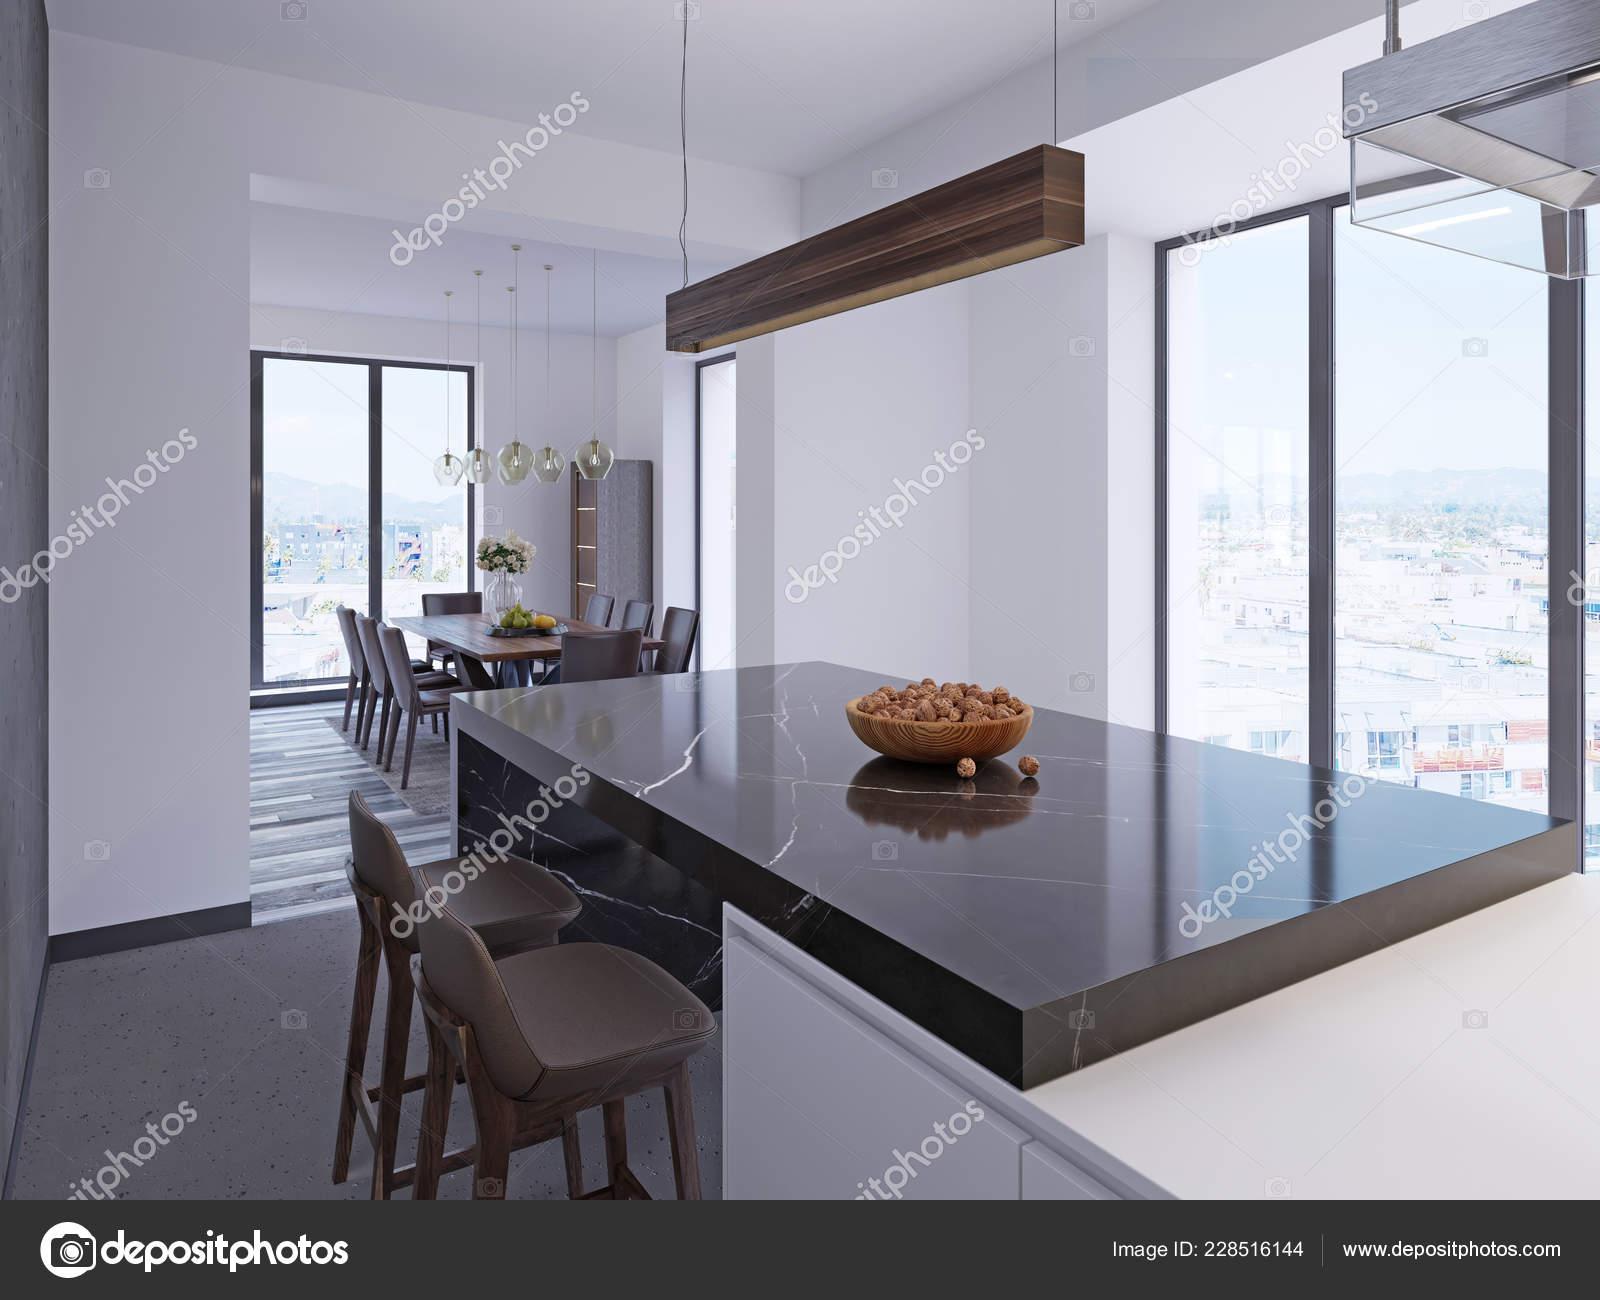 Modern Bar Counter Contemporary Kitchen Dining Area Large Panoramic Windows Stock Photo C Kuprin33 228516144